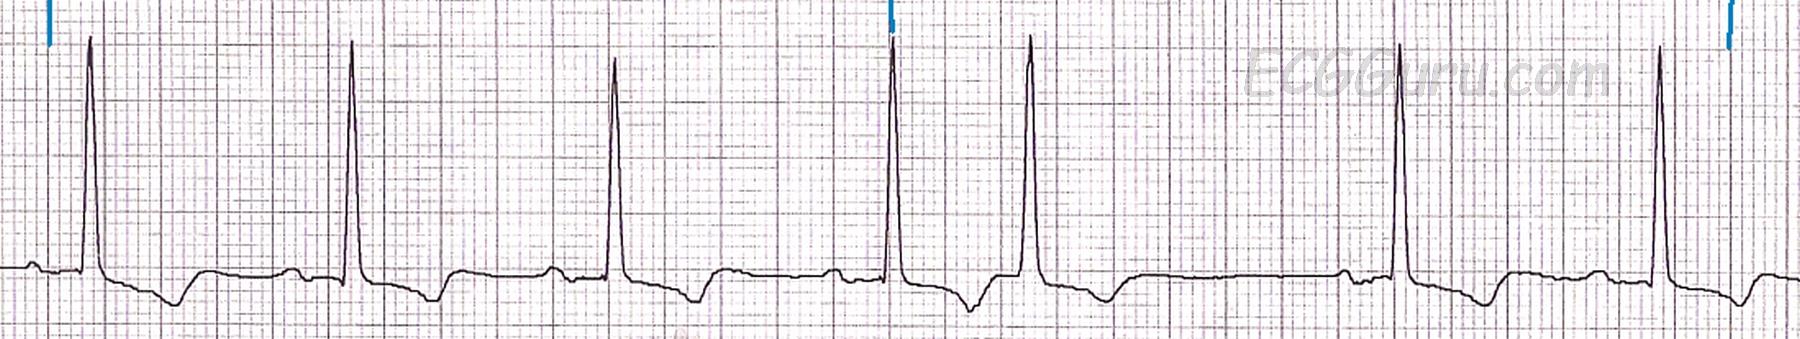 ECG Basics: Sinus Rhythm With A Premature Beat | ECG Guru ...